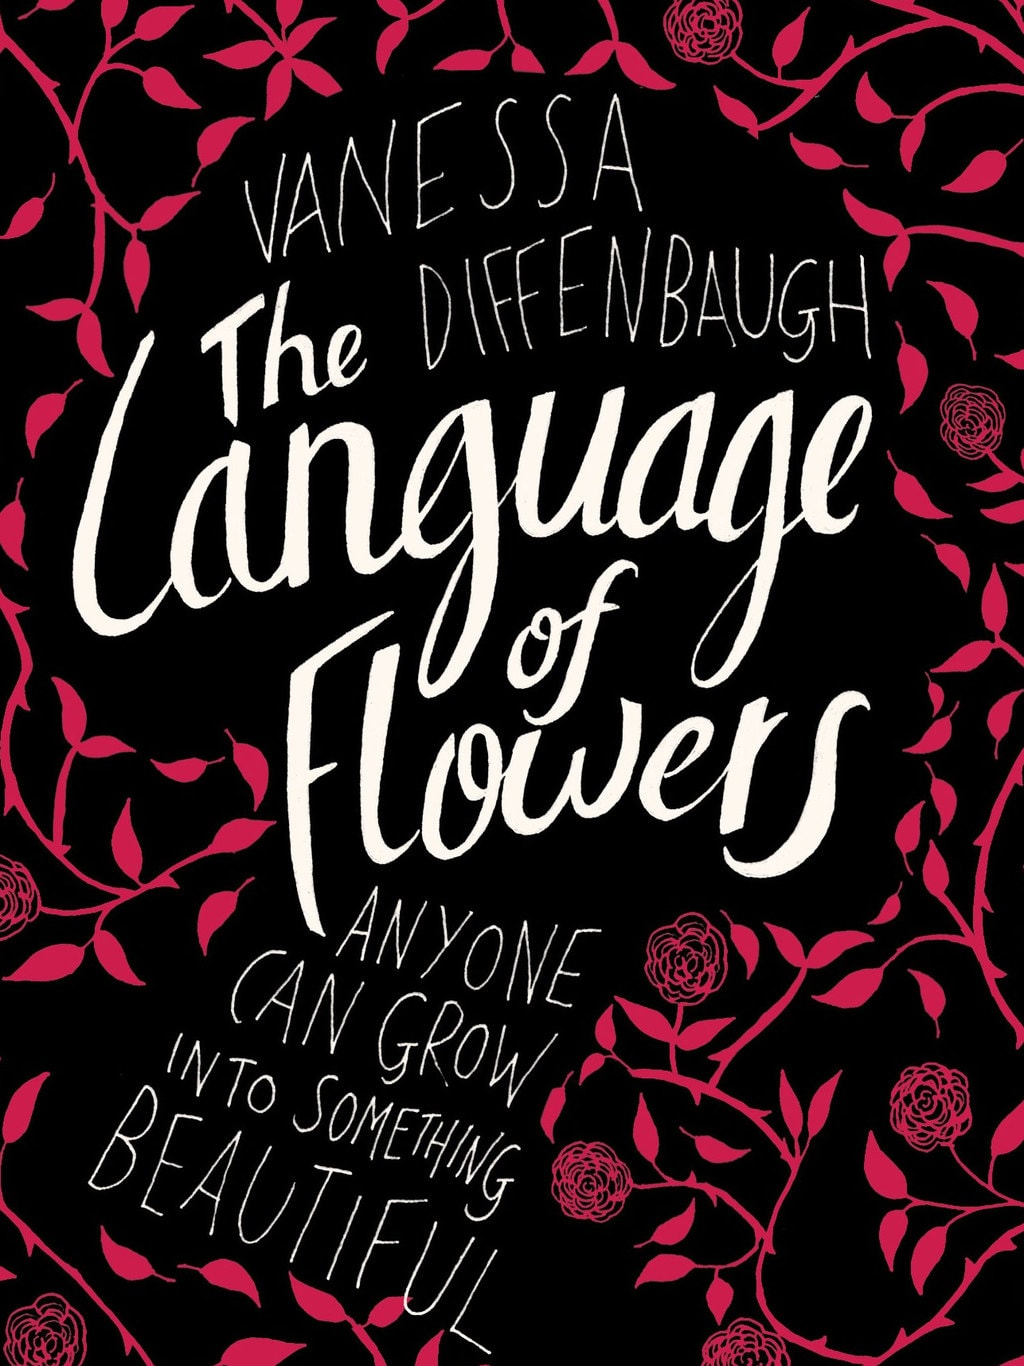 Language of Flowers by Vanessa Diffenbaugh